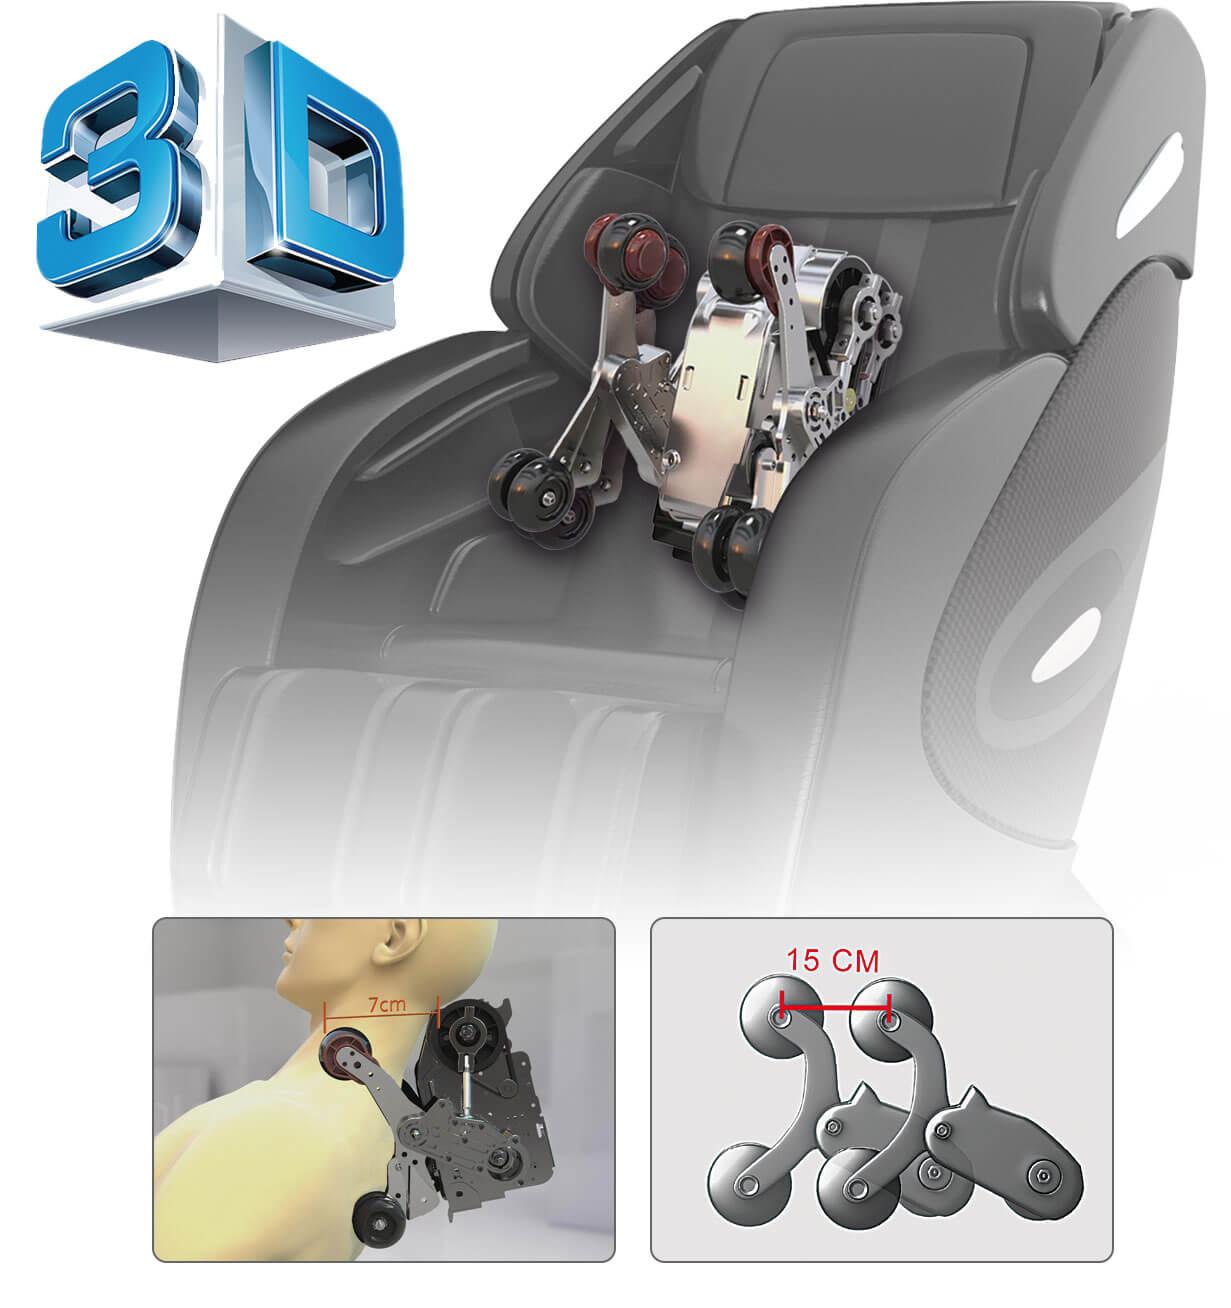 IndulgePMC3400L-3D-massageMechanism-poatriat